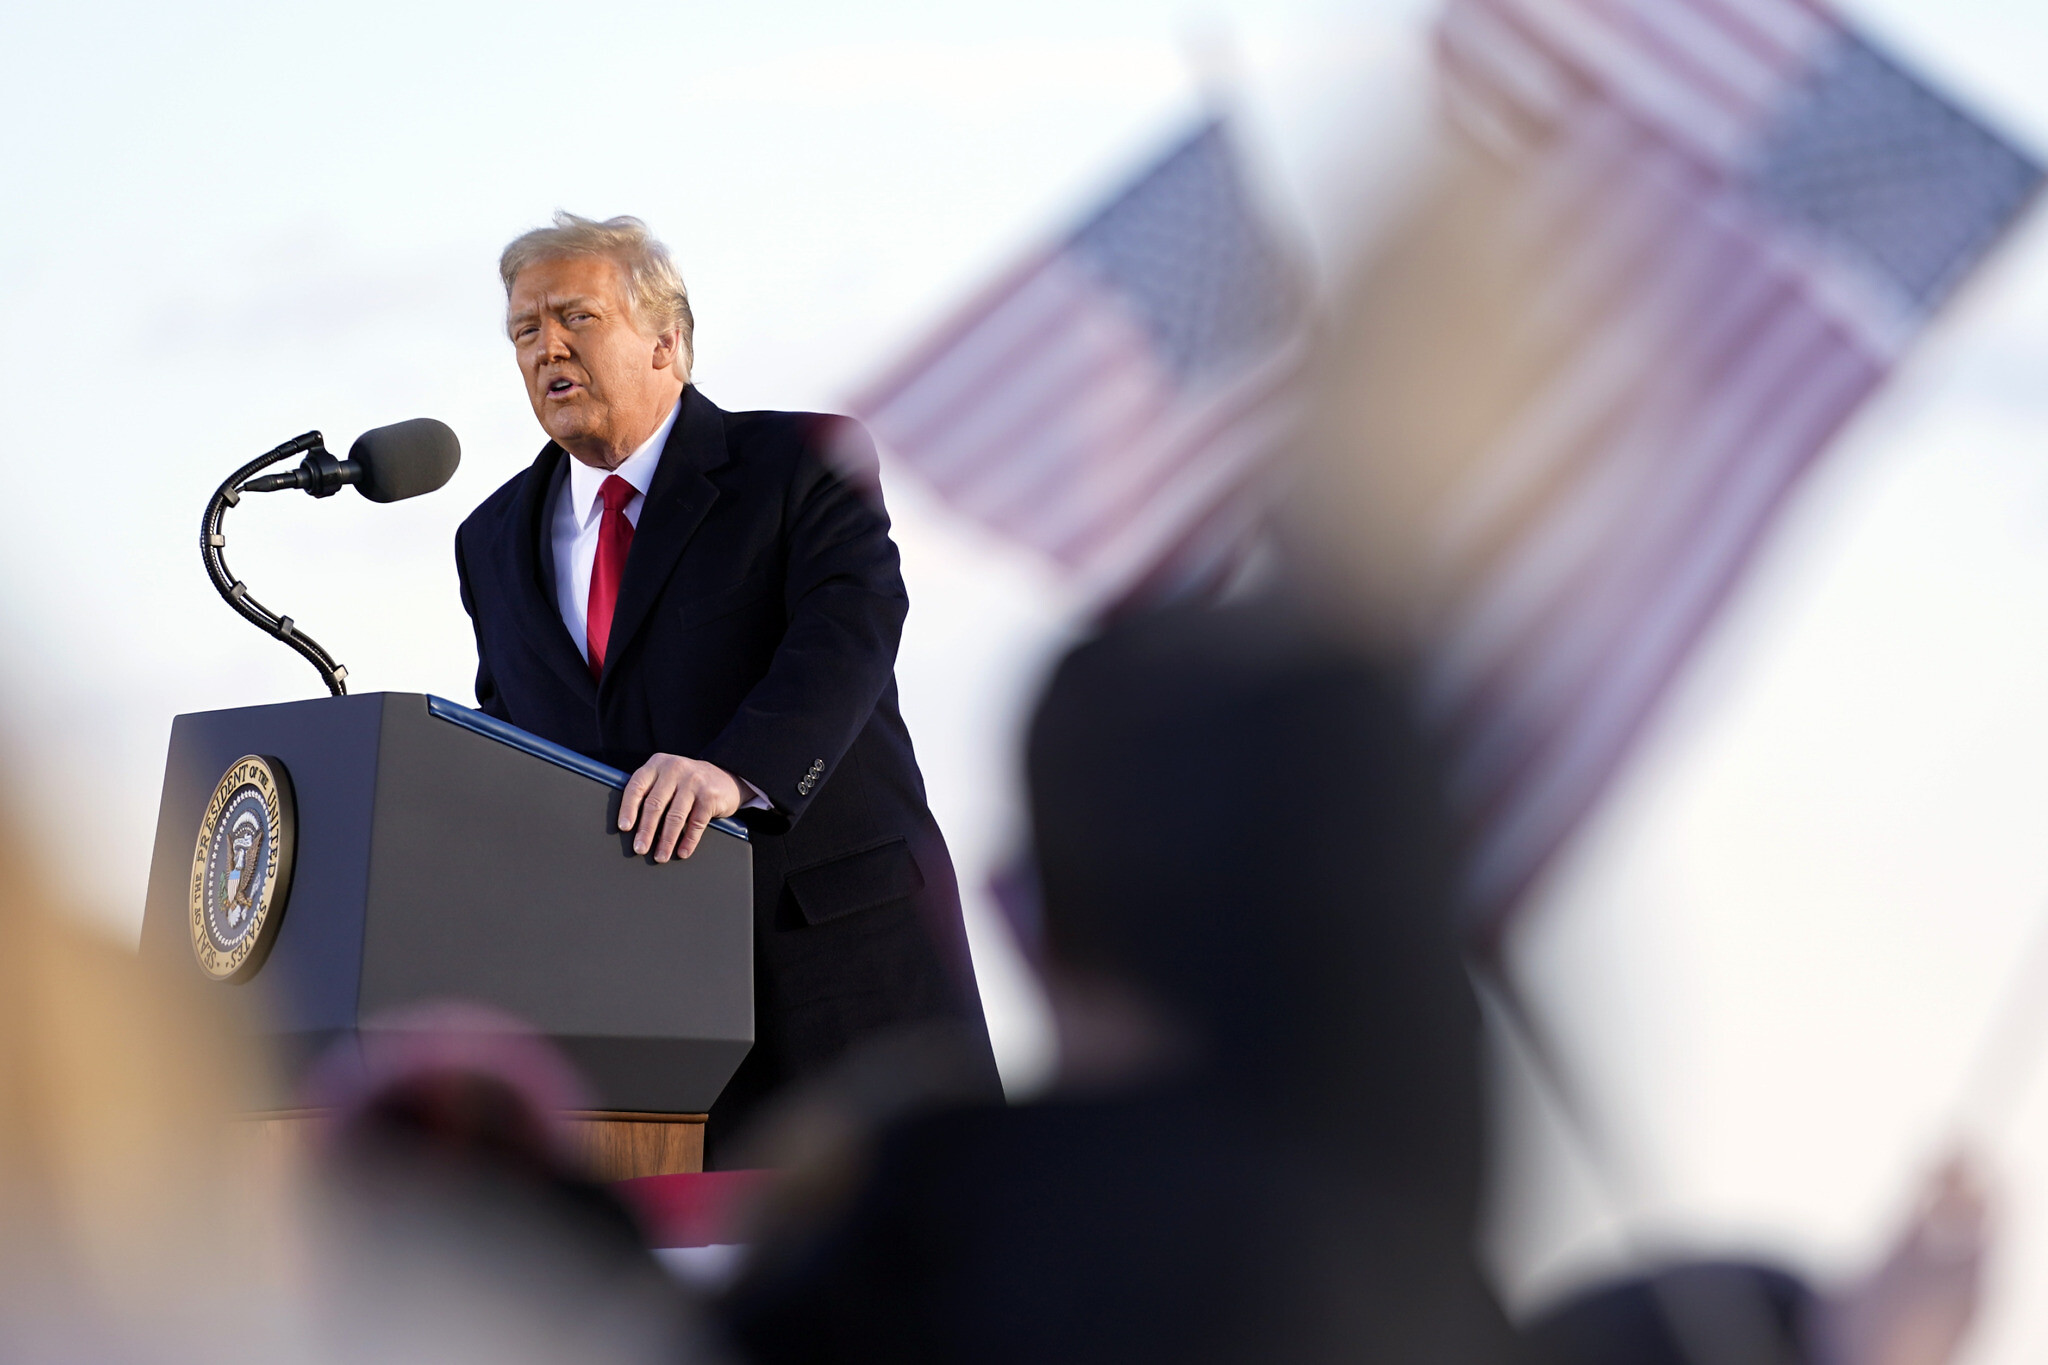 With Trump conviction increasingly unlikely, some senators eye censure